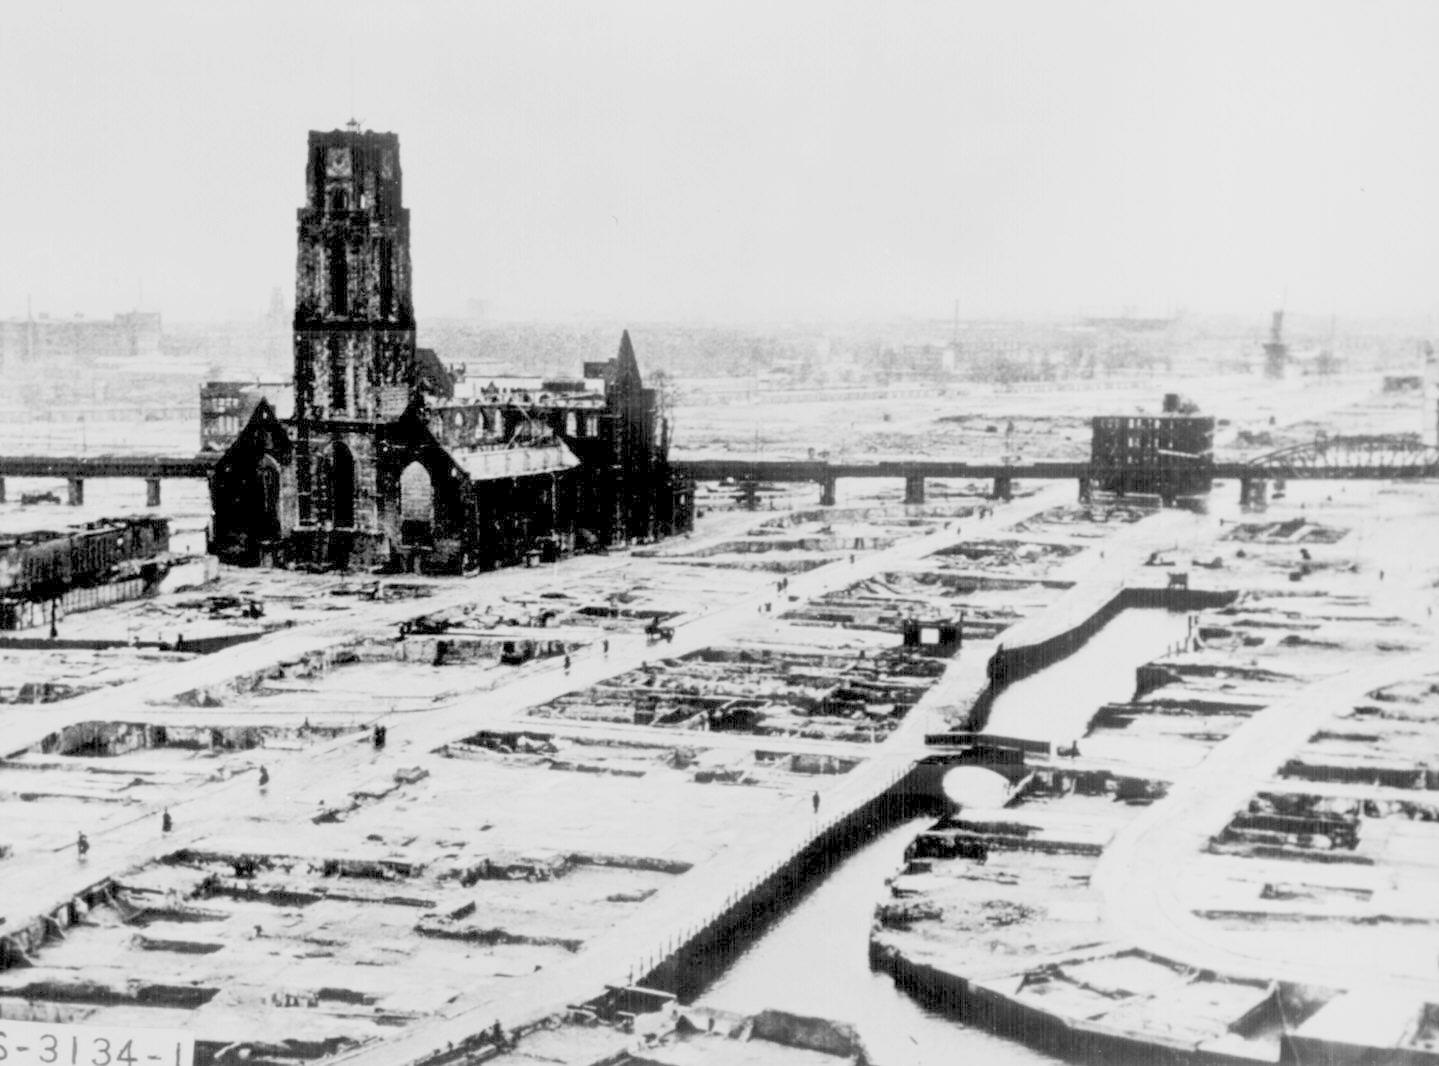 http://spiritualpilgrim.net/pictures/20_World-War-Two/NA_1945_Rotterdam-in-ruins.jpg